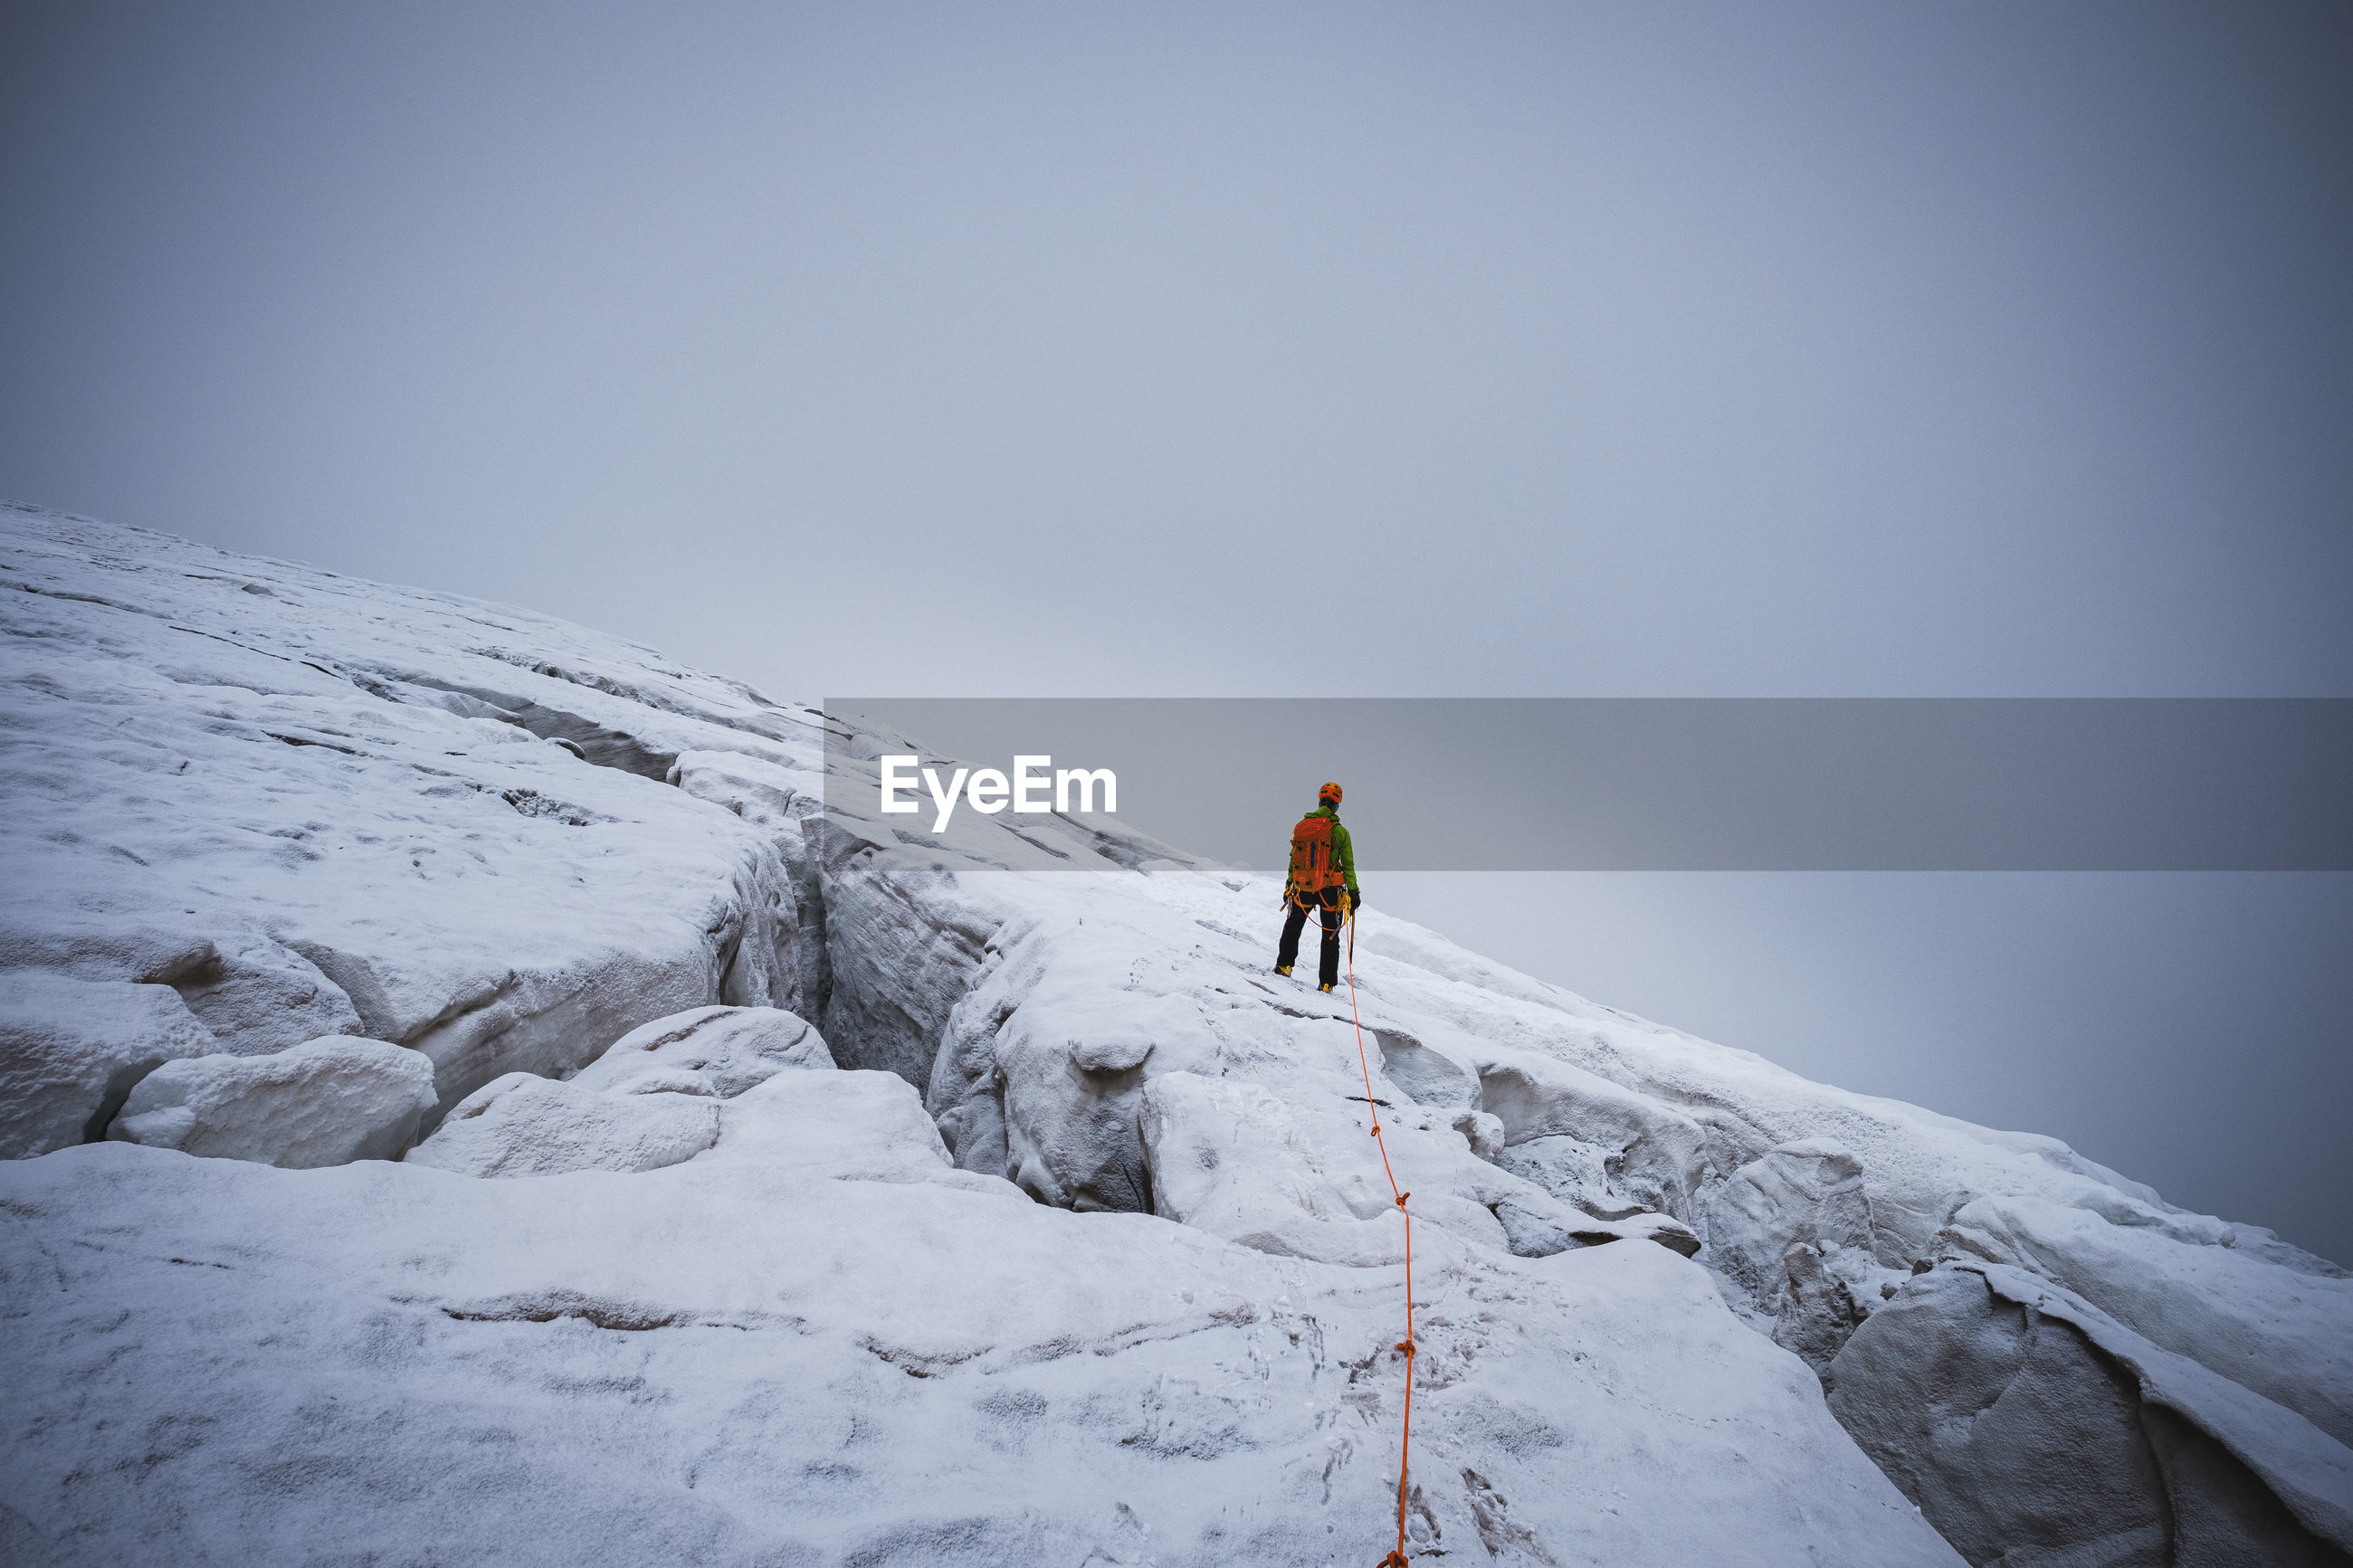 Rear view of person on glacier